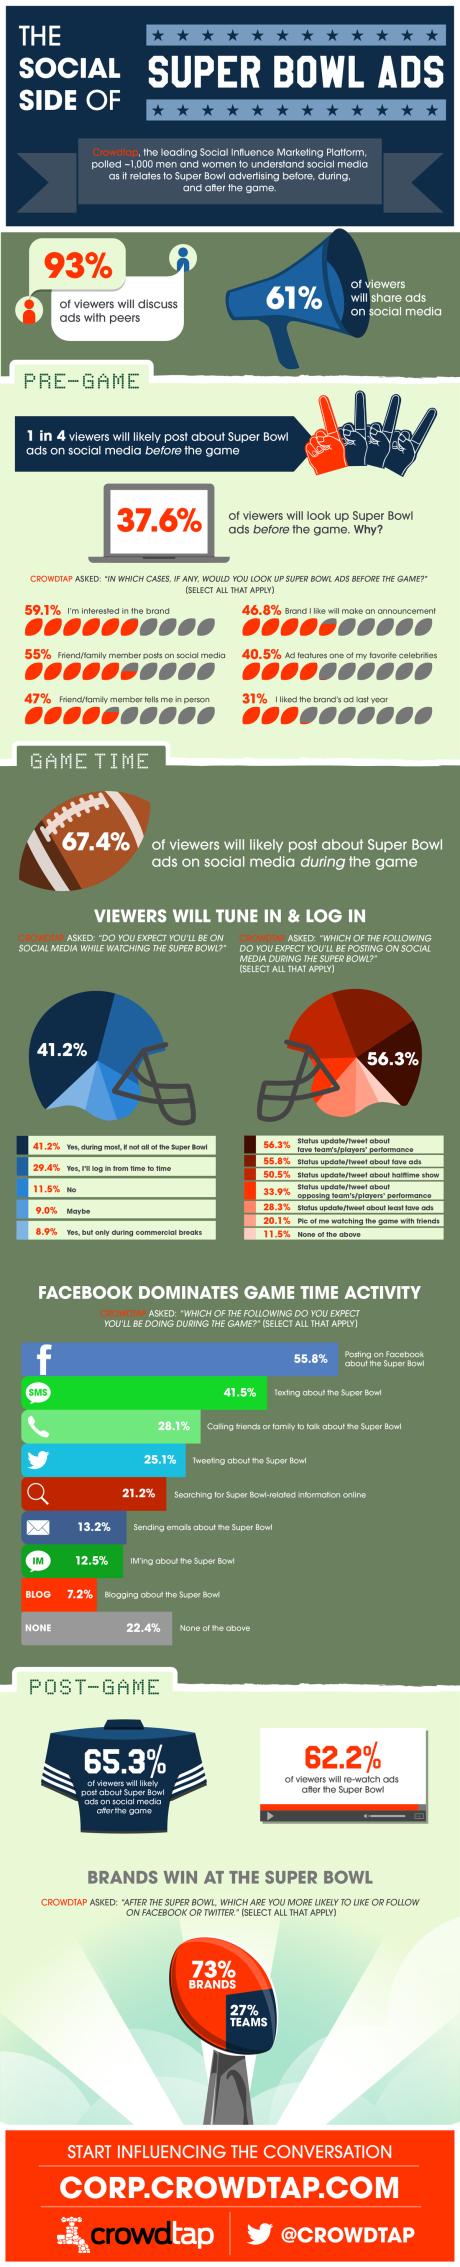 The-Social-Side-of-Super-Bowl-Ads-Revised-for-Mashable